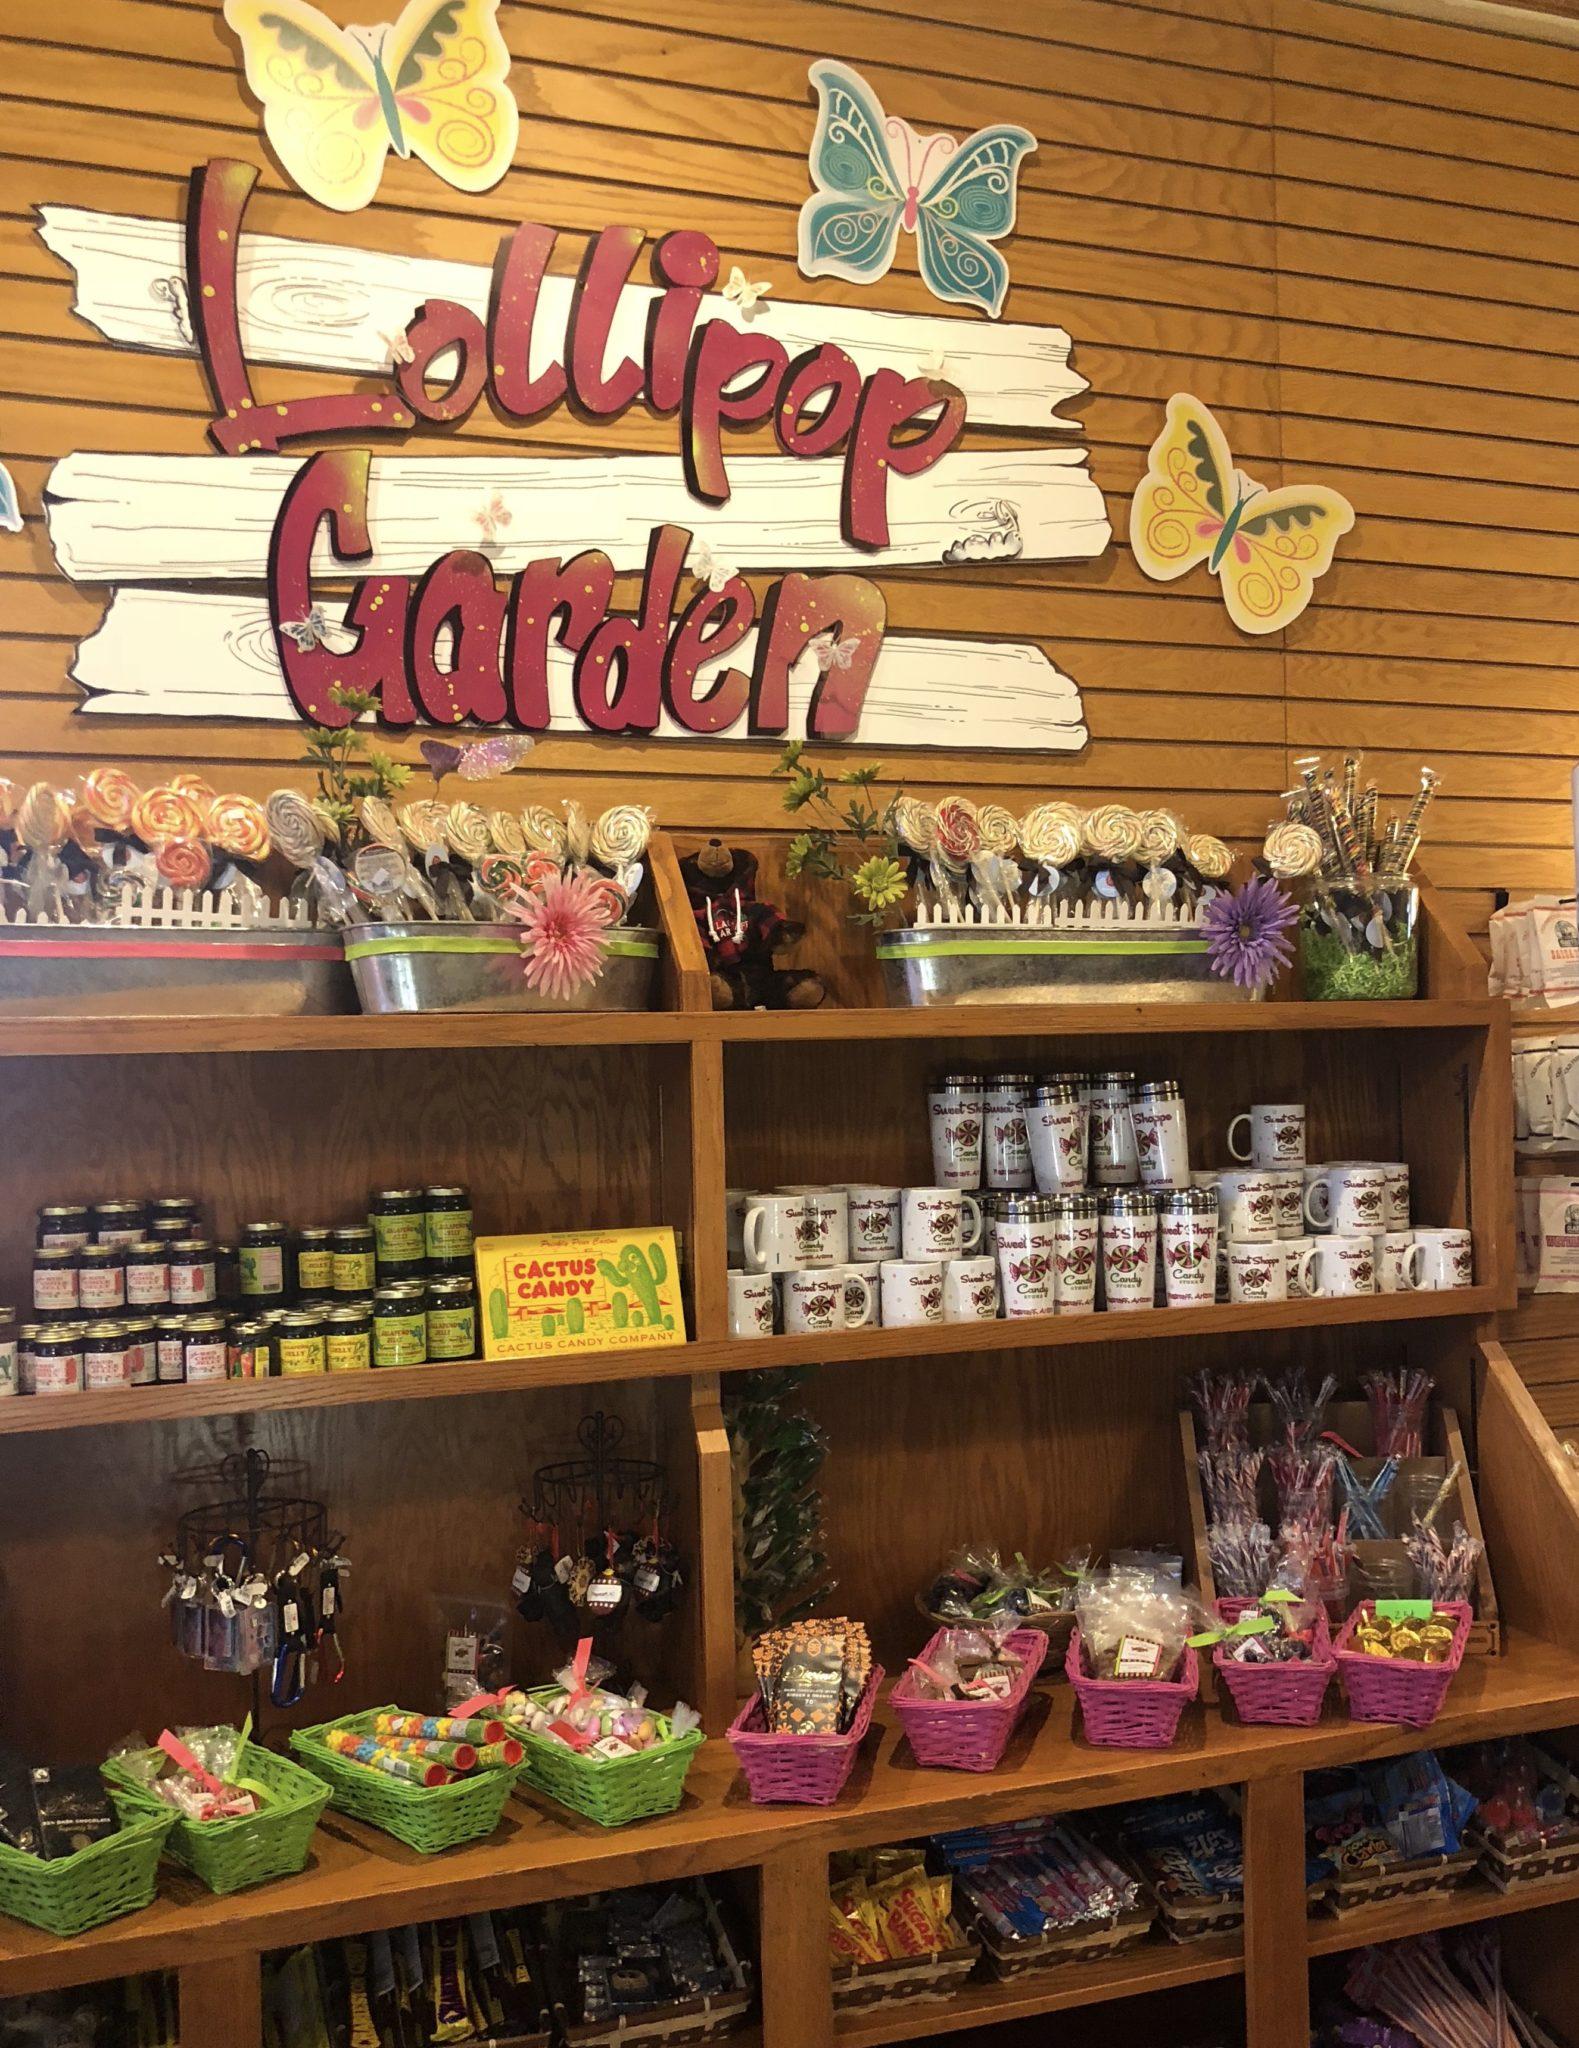 4Chion Lifestyle sweet shoppe flagstaff